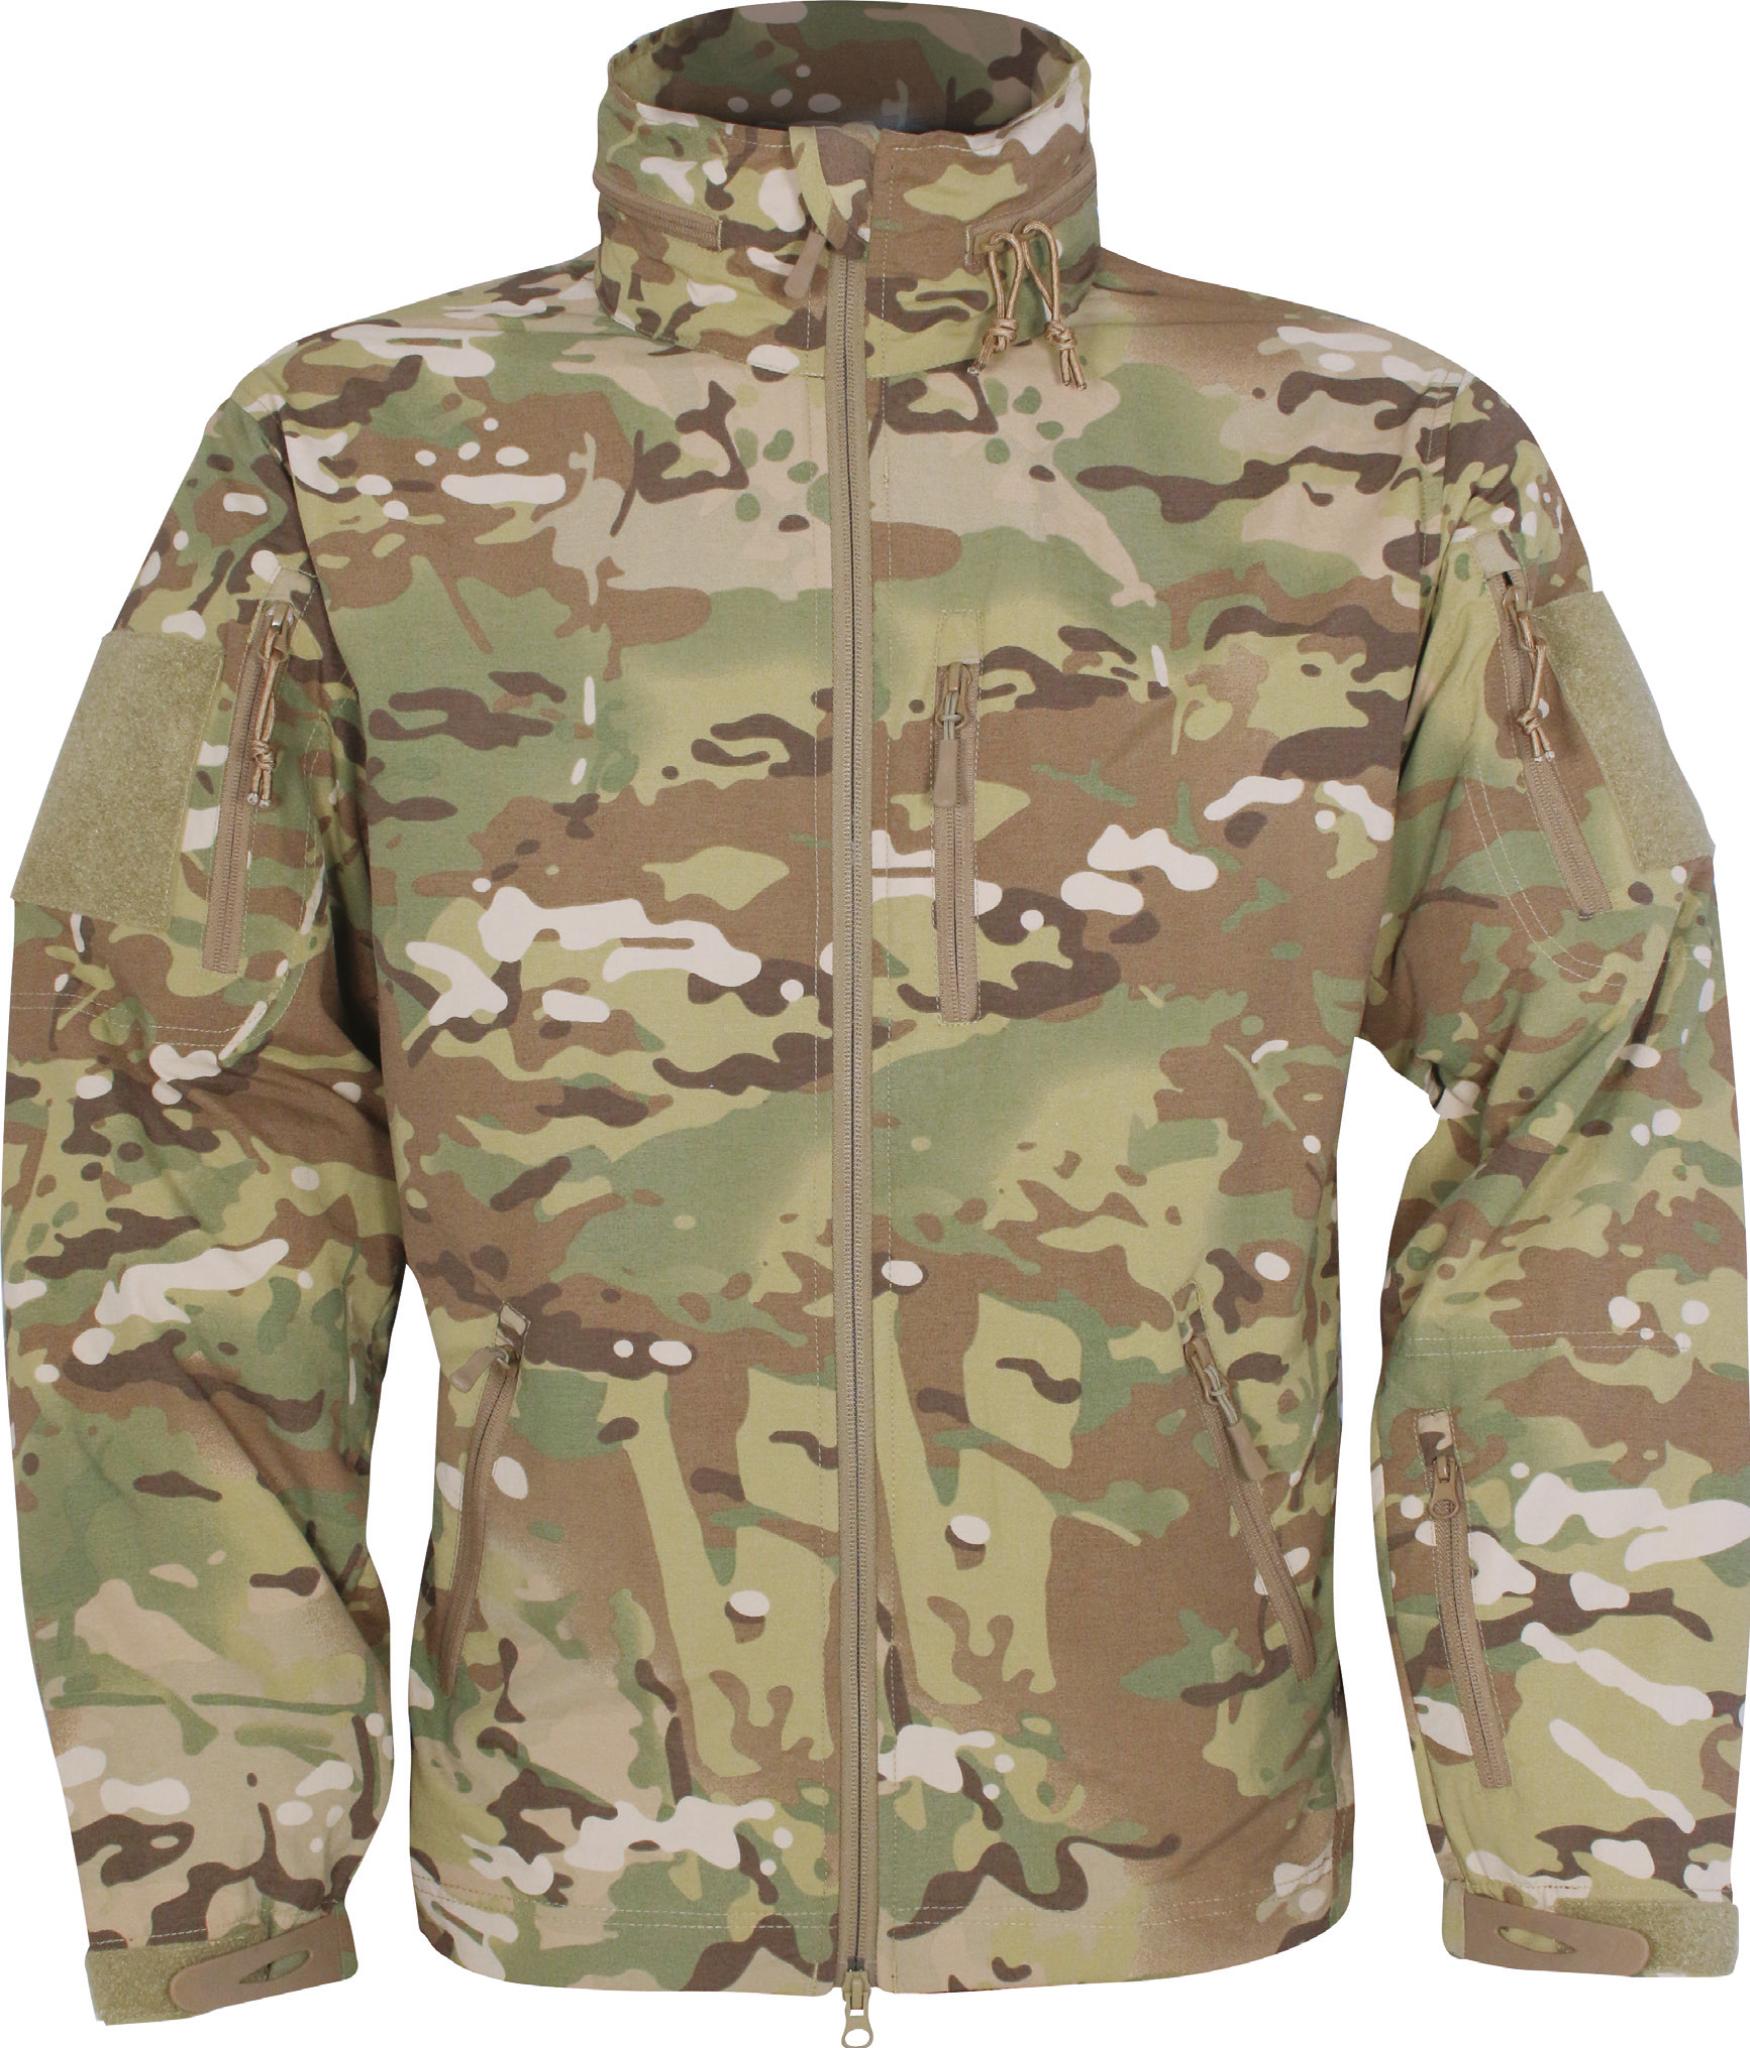 Viper Tactical Elite Jacket & Trousers